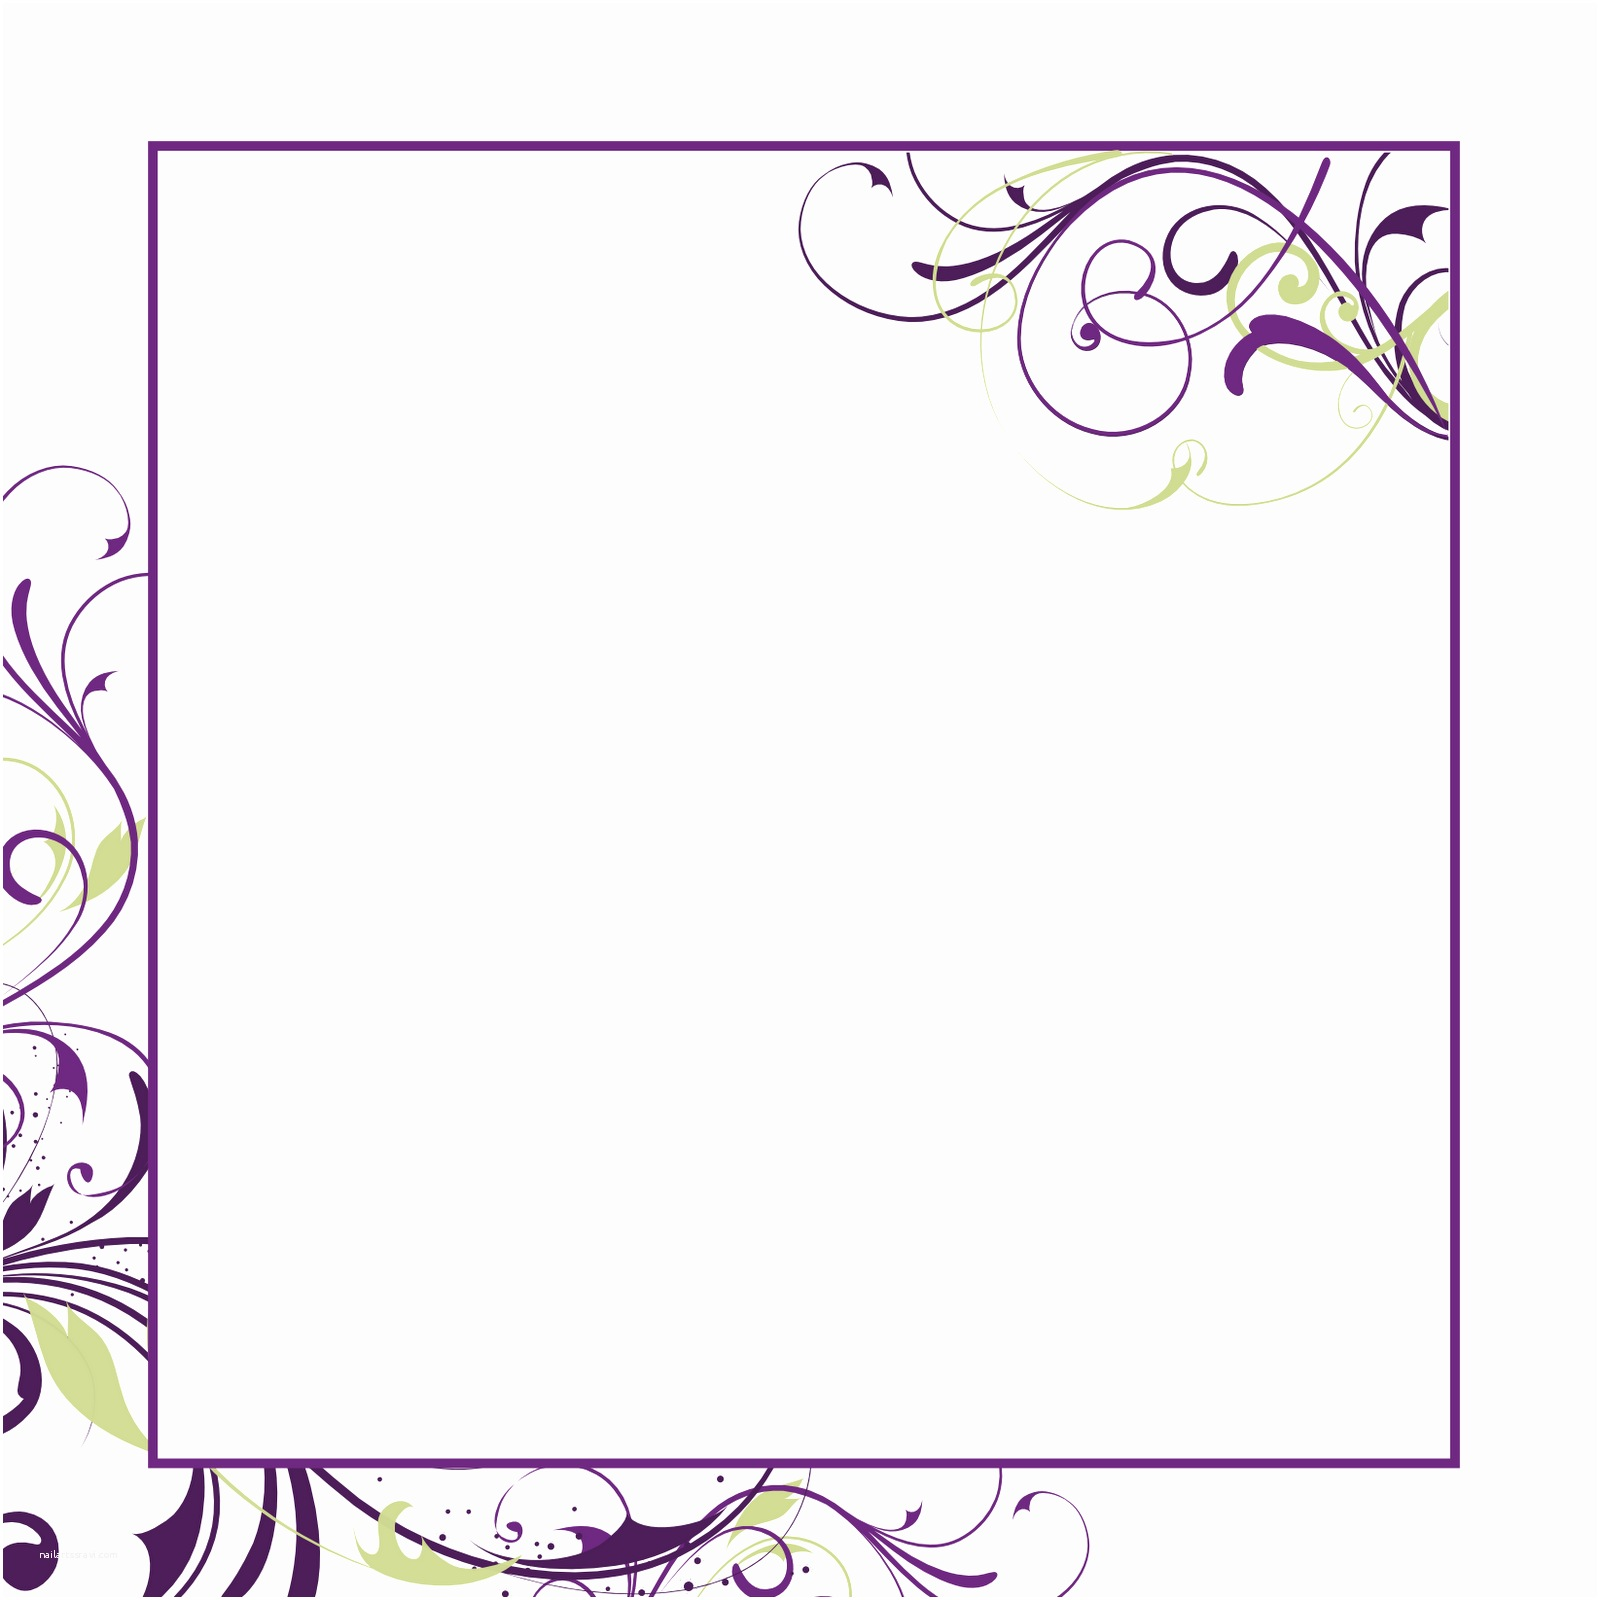 Blank Wedding Invitations Free Invitation Templates Printable theagiot Mhf4ydhe